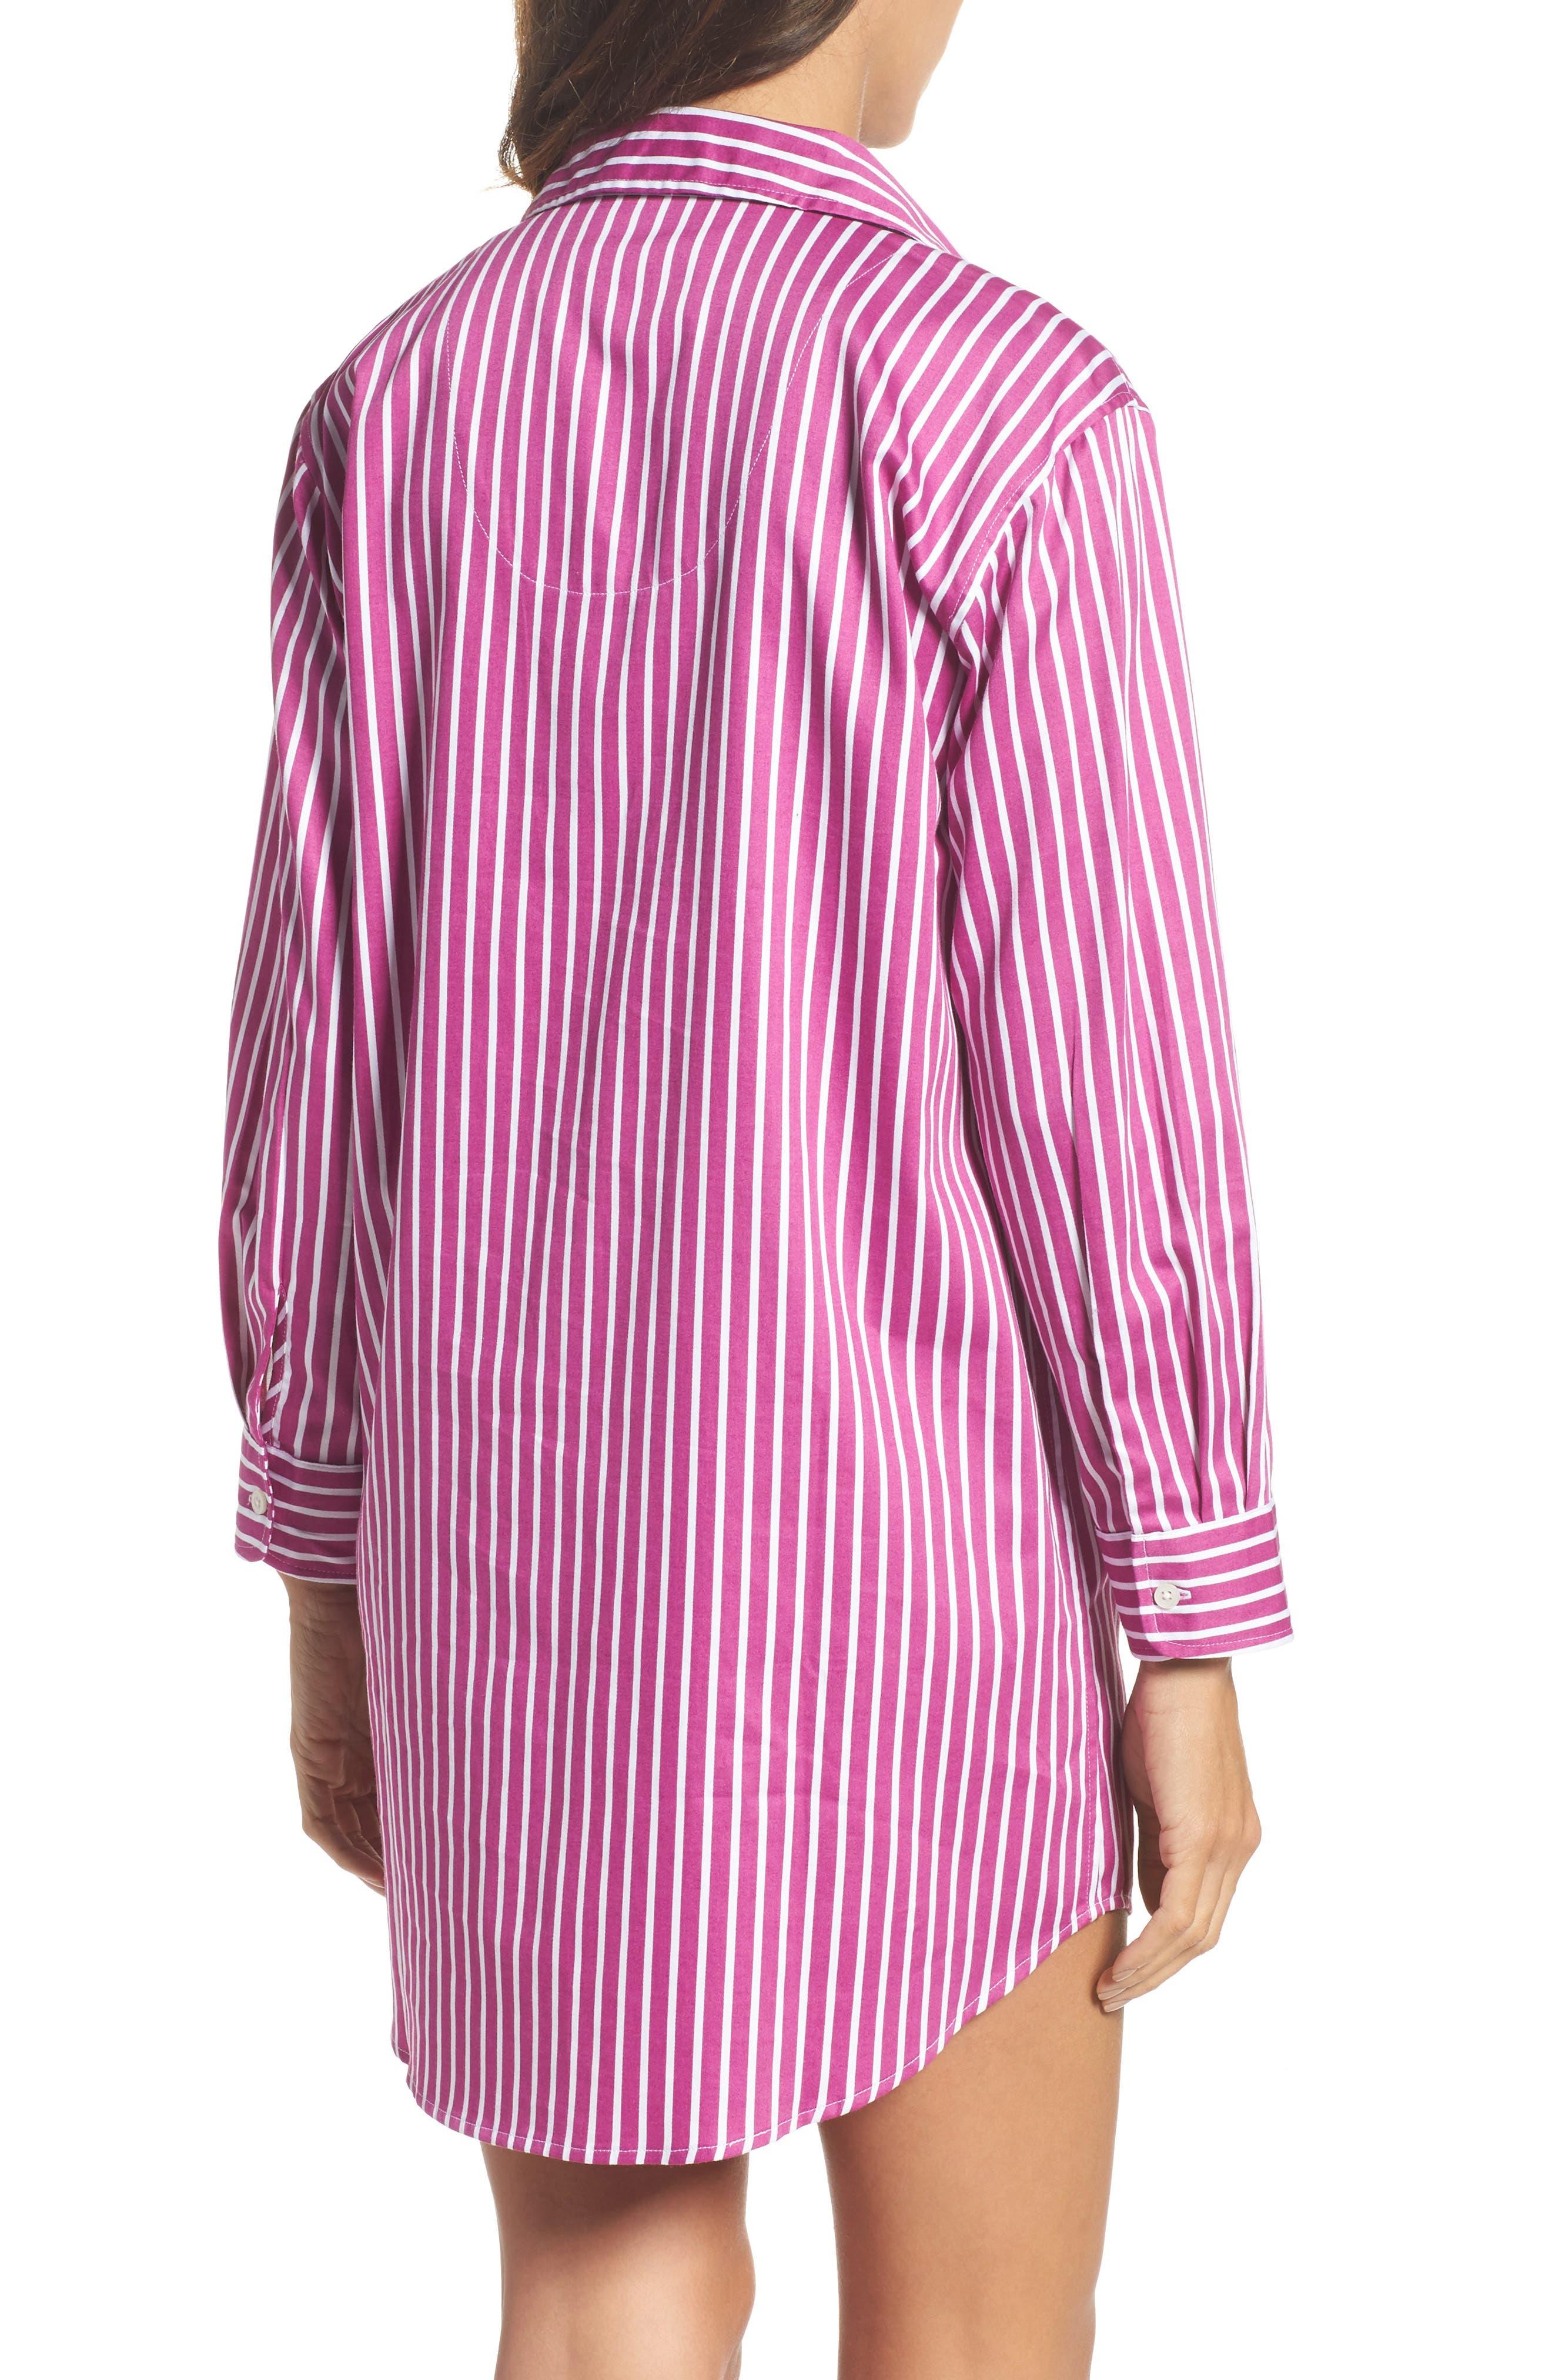 Sleep Shirt,                             Alternate thumbnail 2, color,                             690